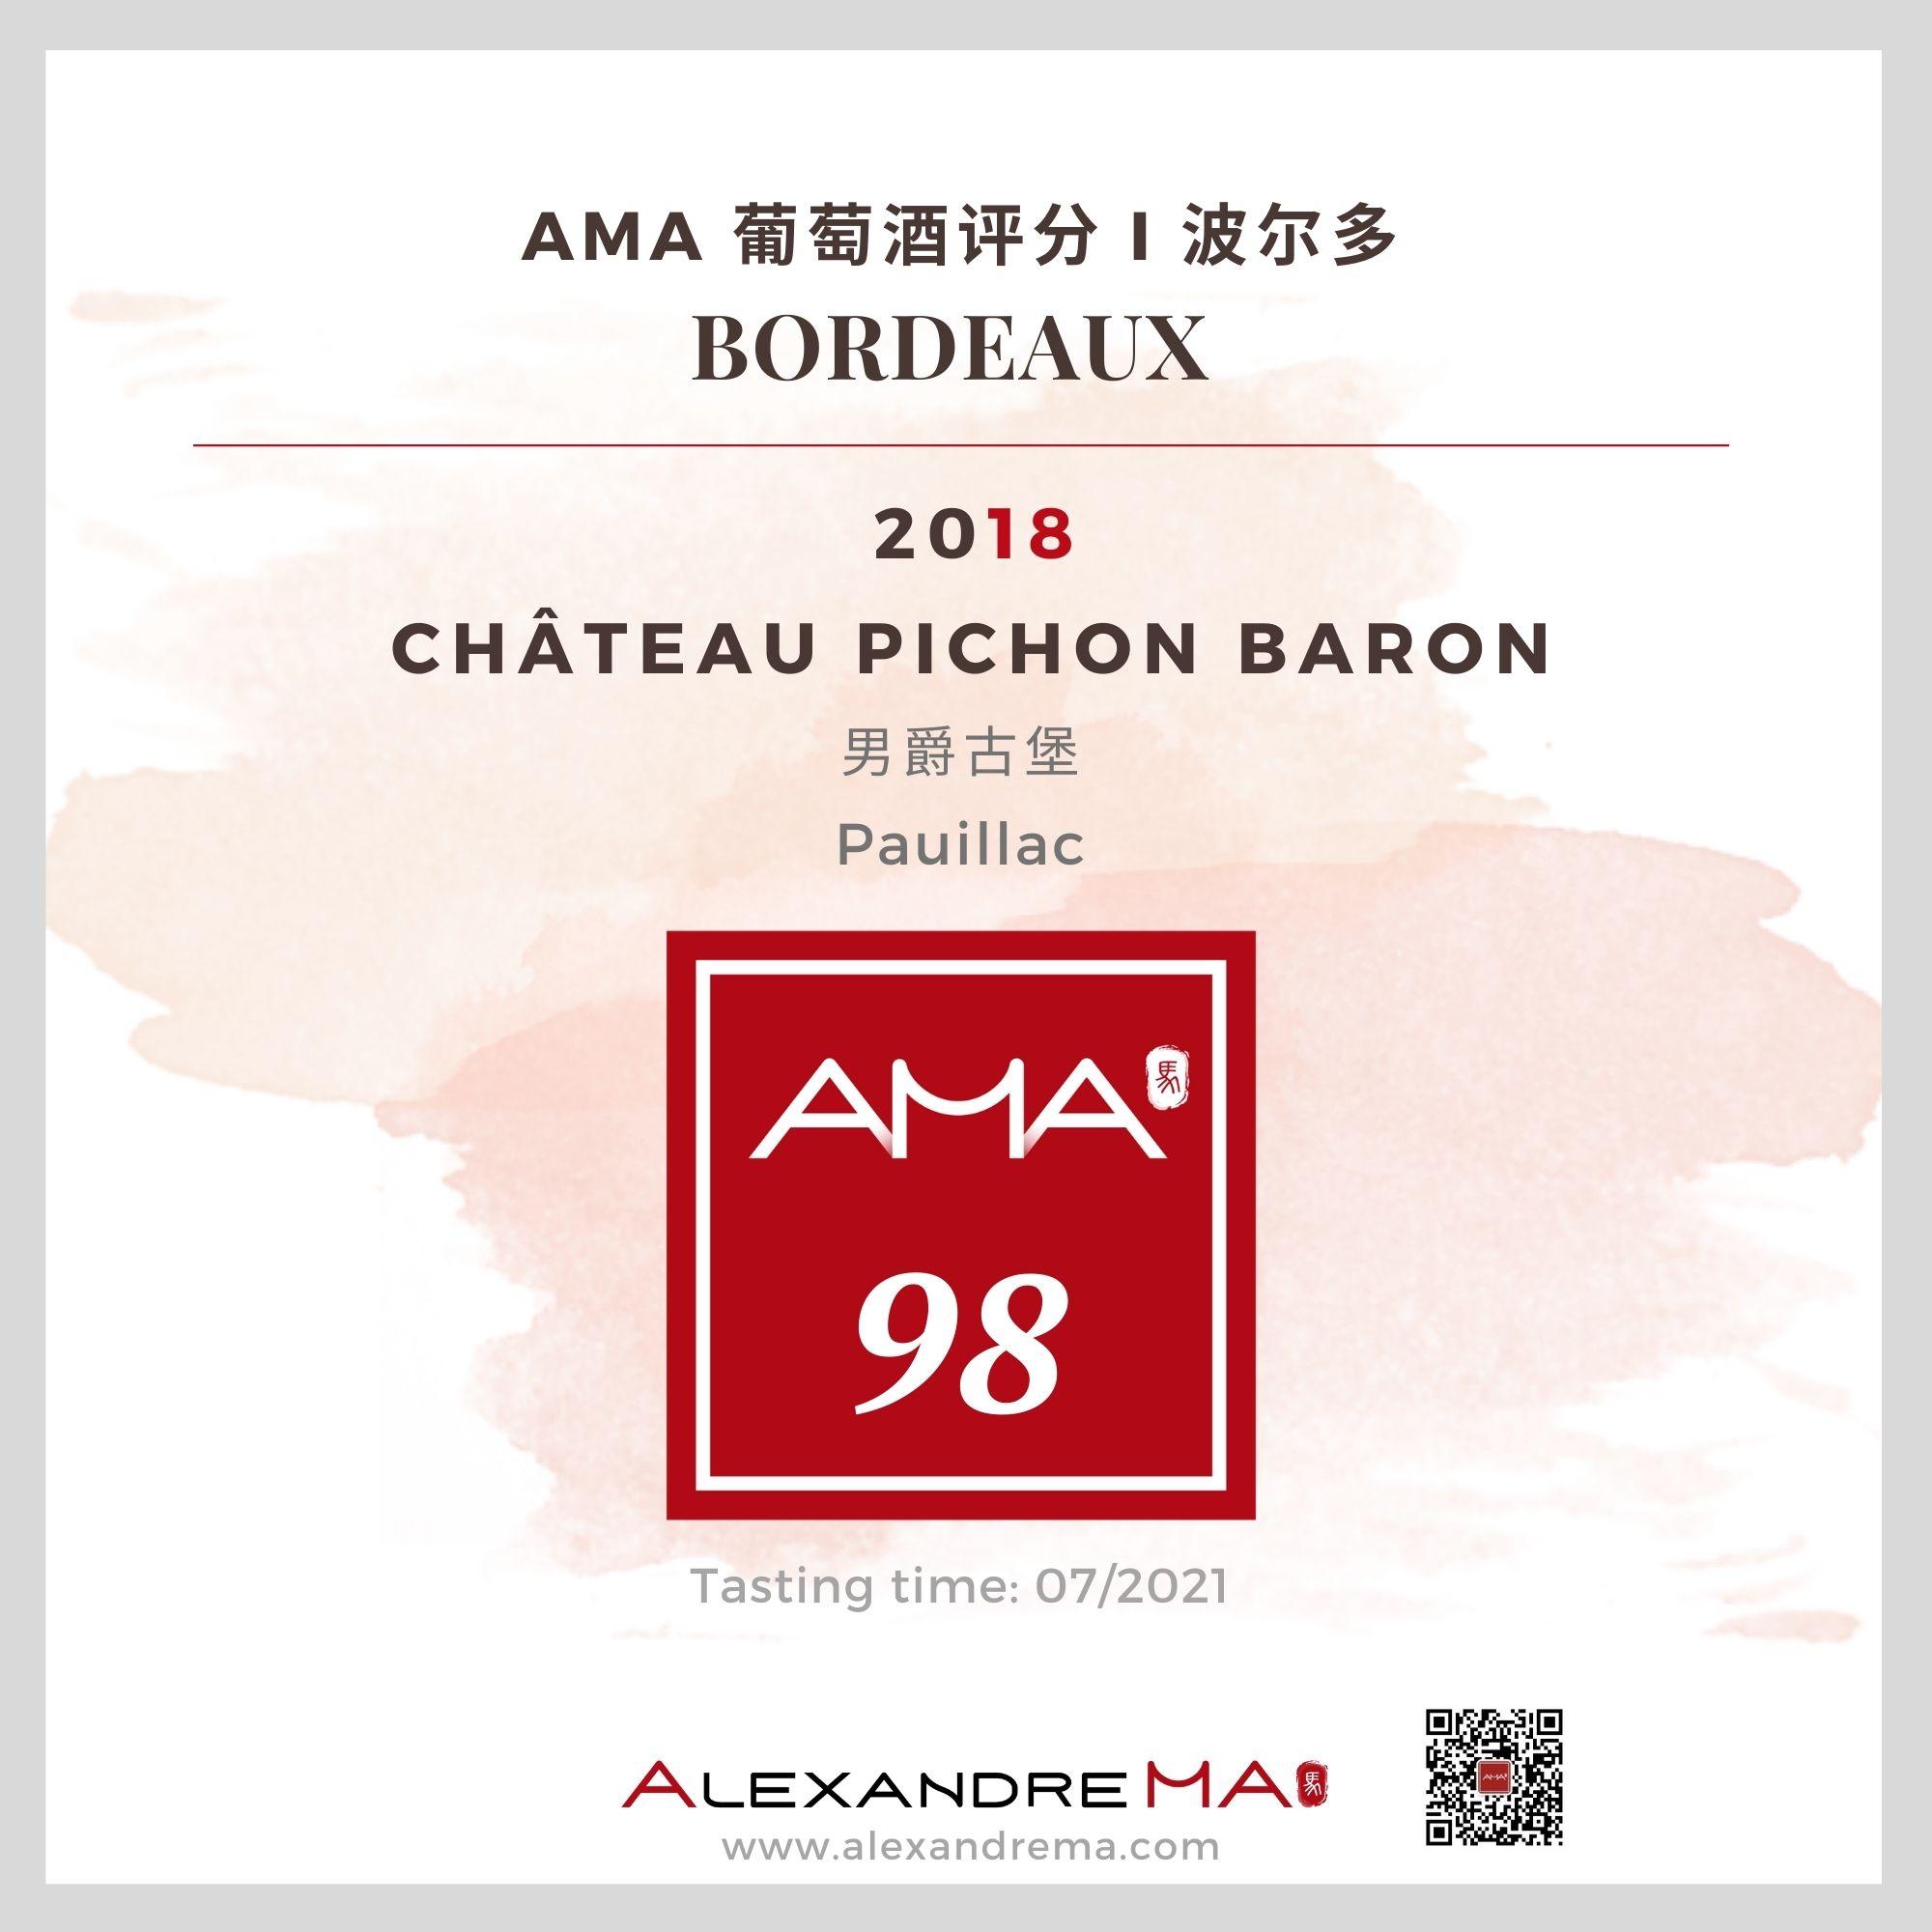 Château Pichon Baron 2018 - Alexandre MA